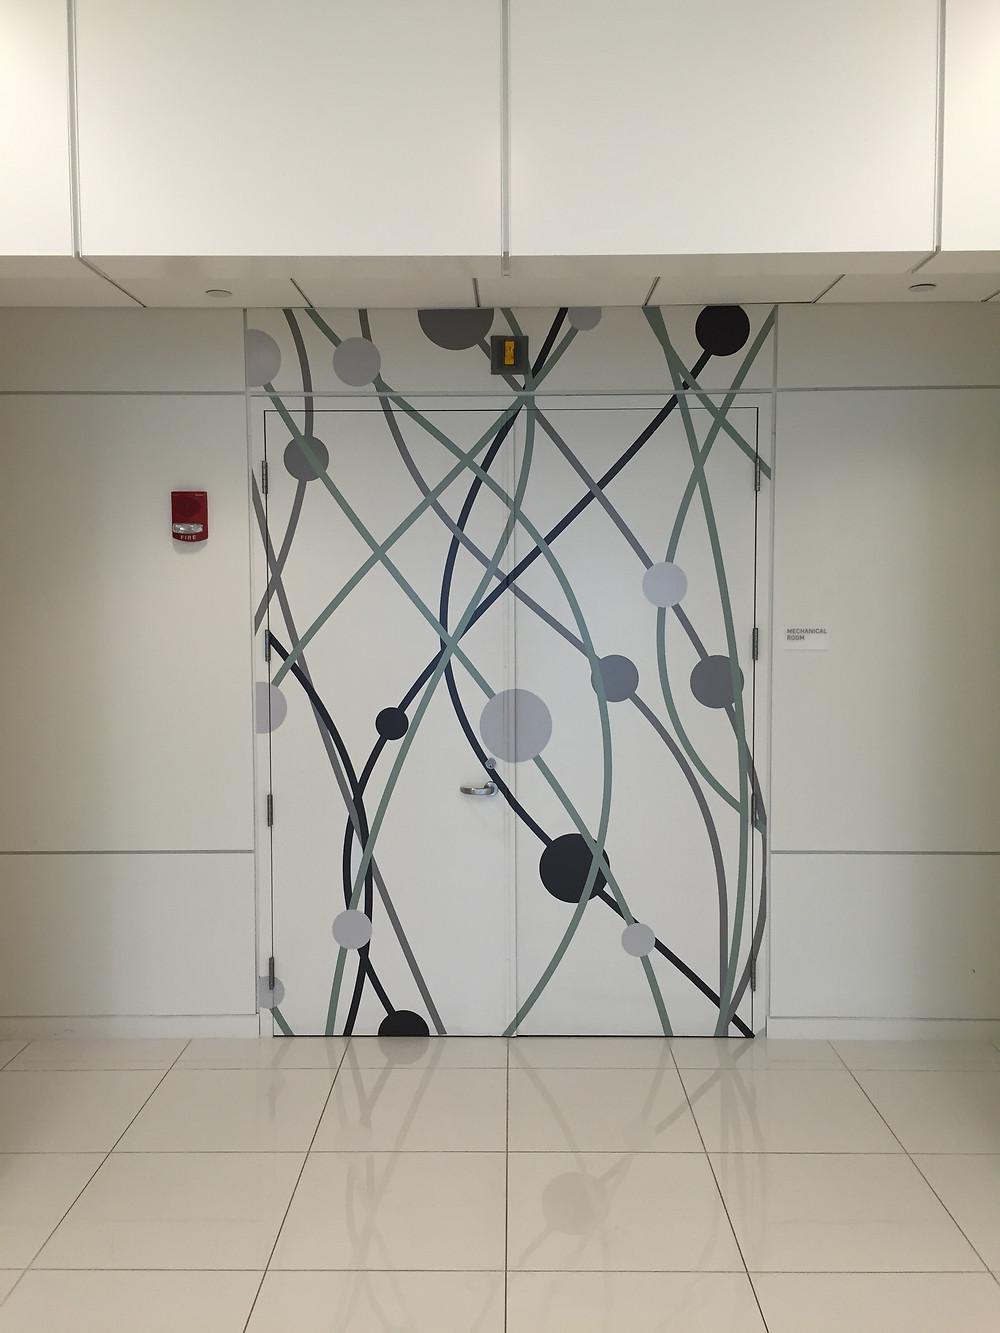 The environmental graphics at Atlas Venture, Cambridge, MA